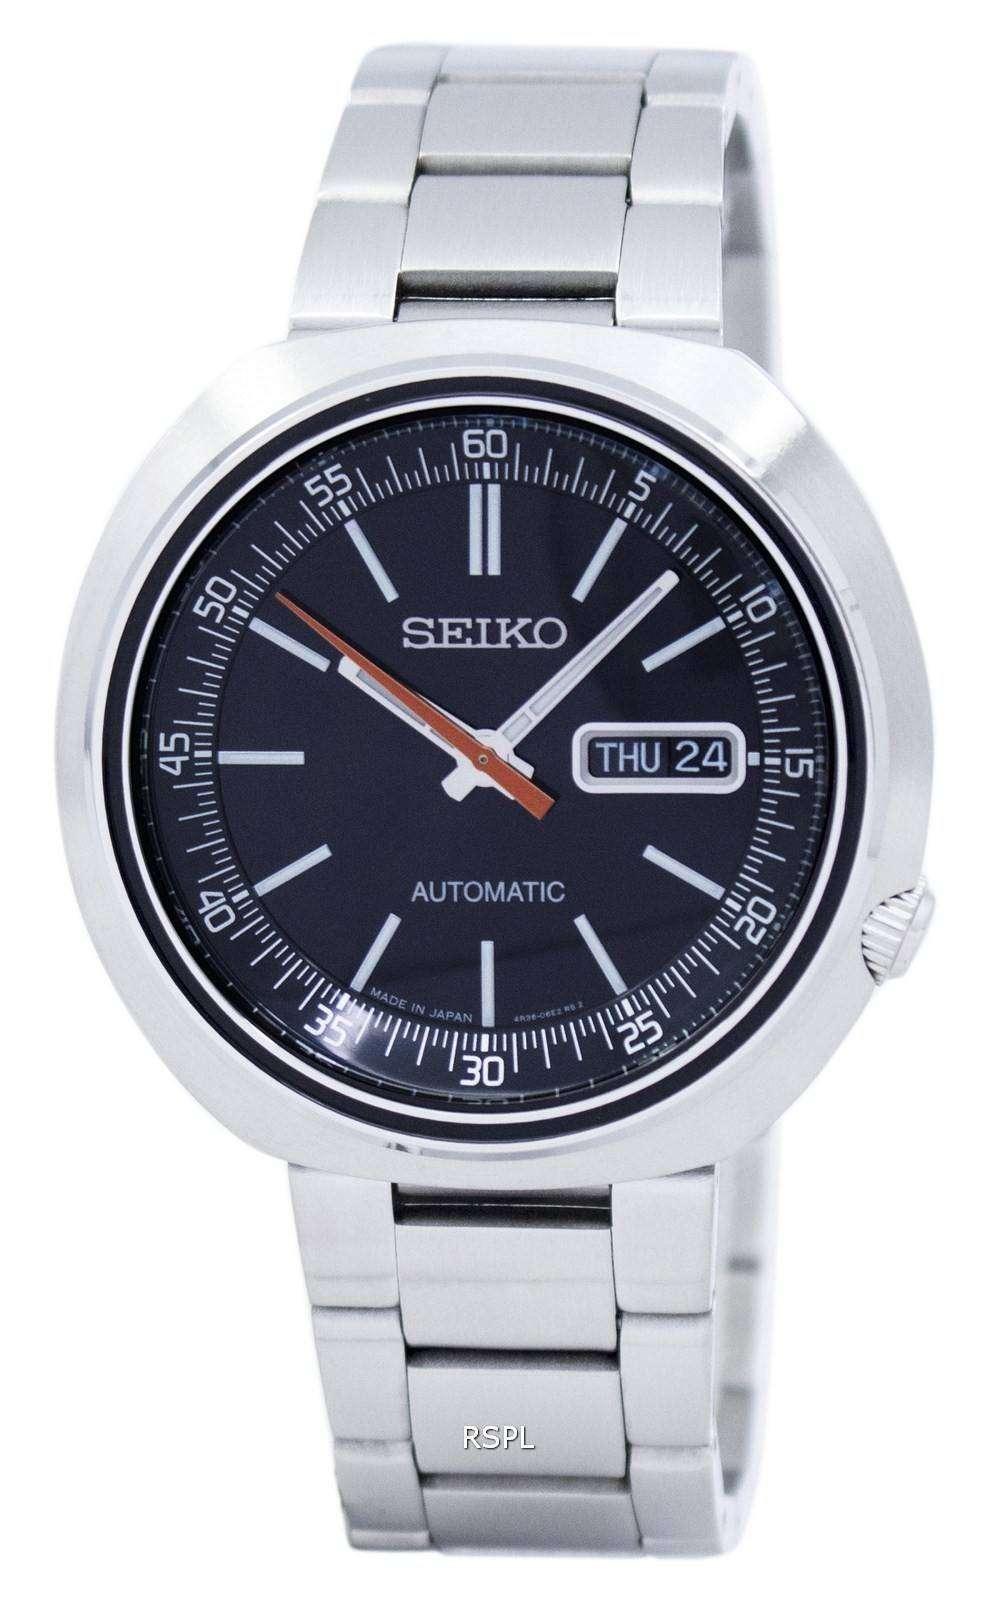 SRPC11 SRPC11J1 SRPC11J メンズ腕時計セイコー自動日本